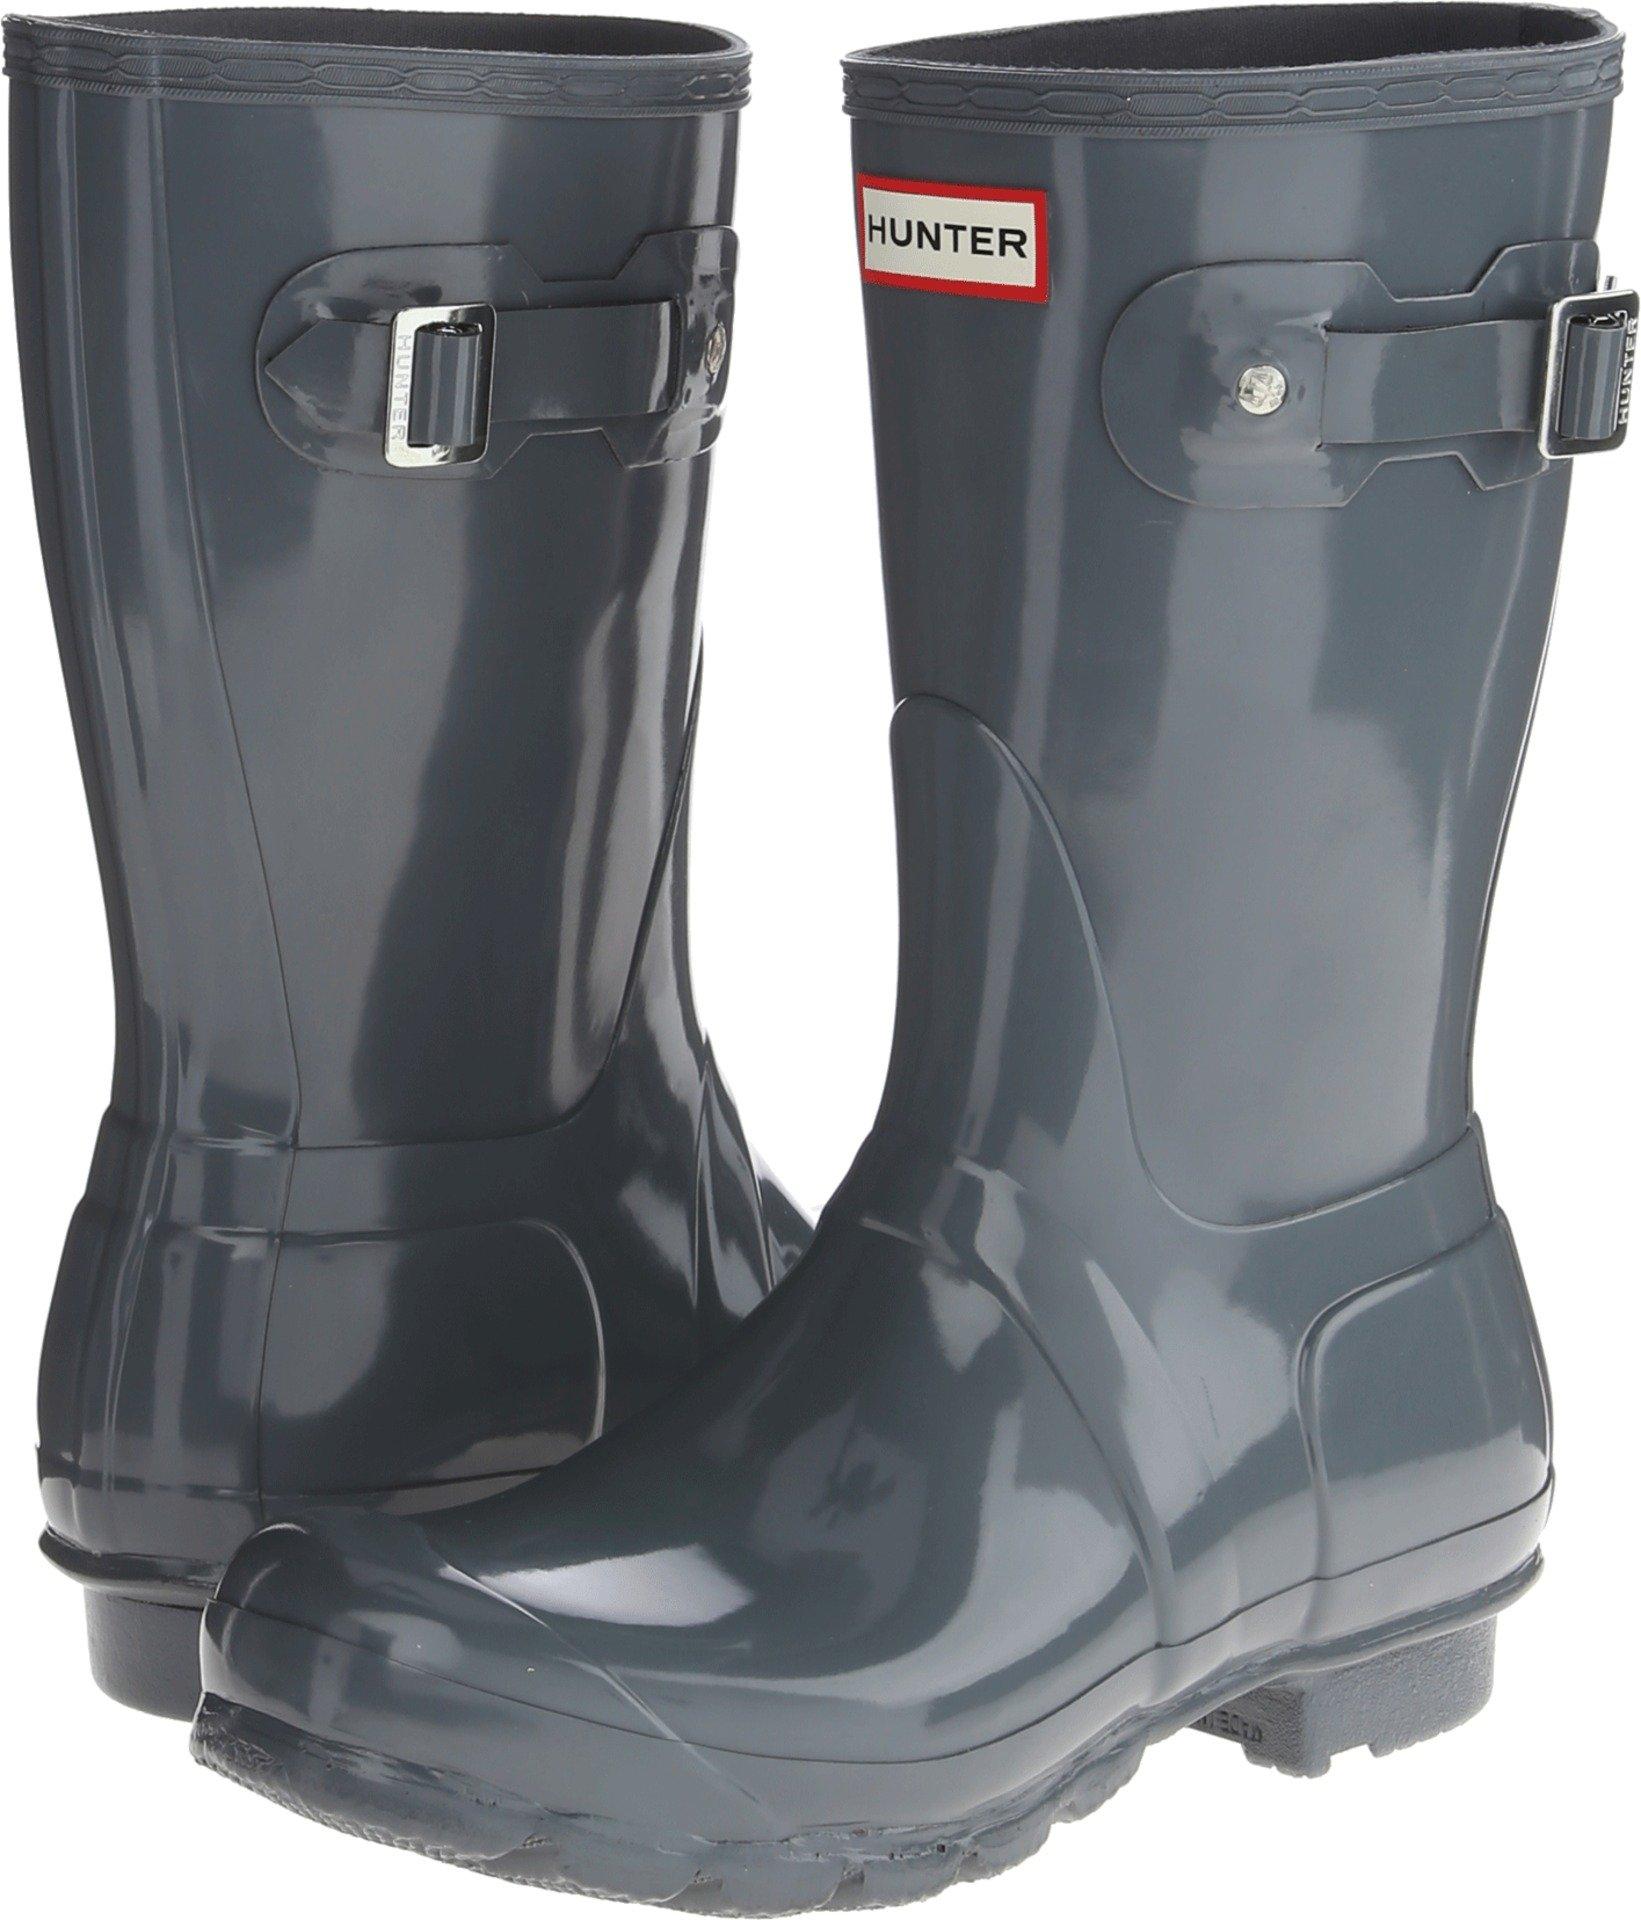 Hunter Women's Original Short Gloss Rain Boots, Graphite Gloss, 5 B(M) US